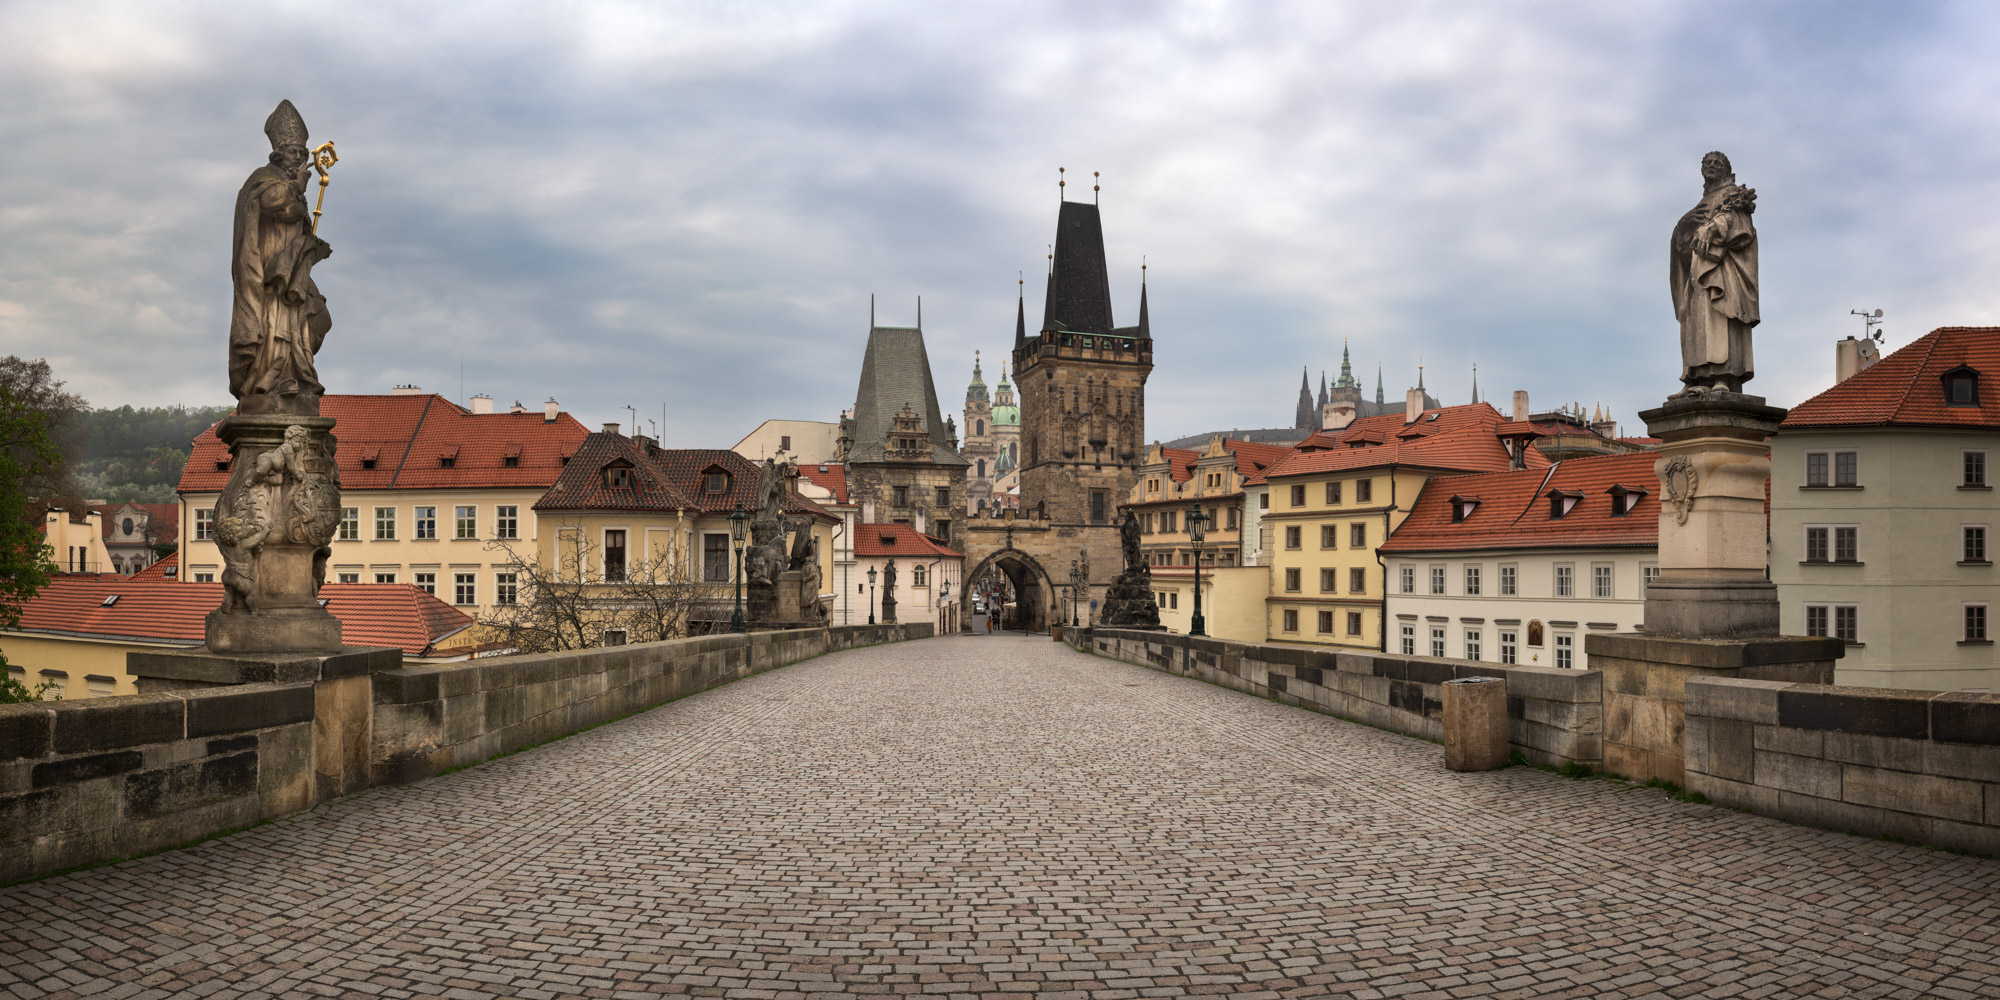 Panorama of Lesser Tower and Charles Bridge, Prague